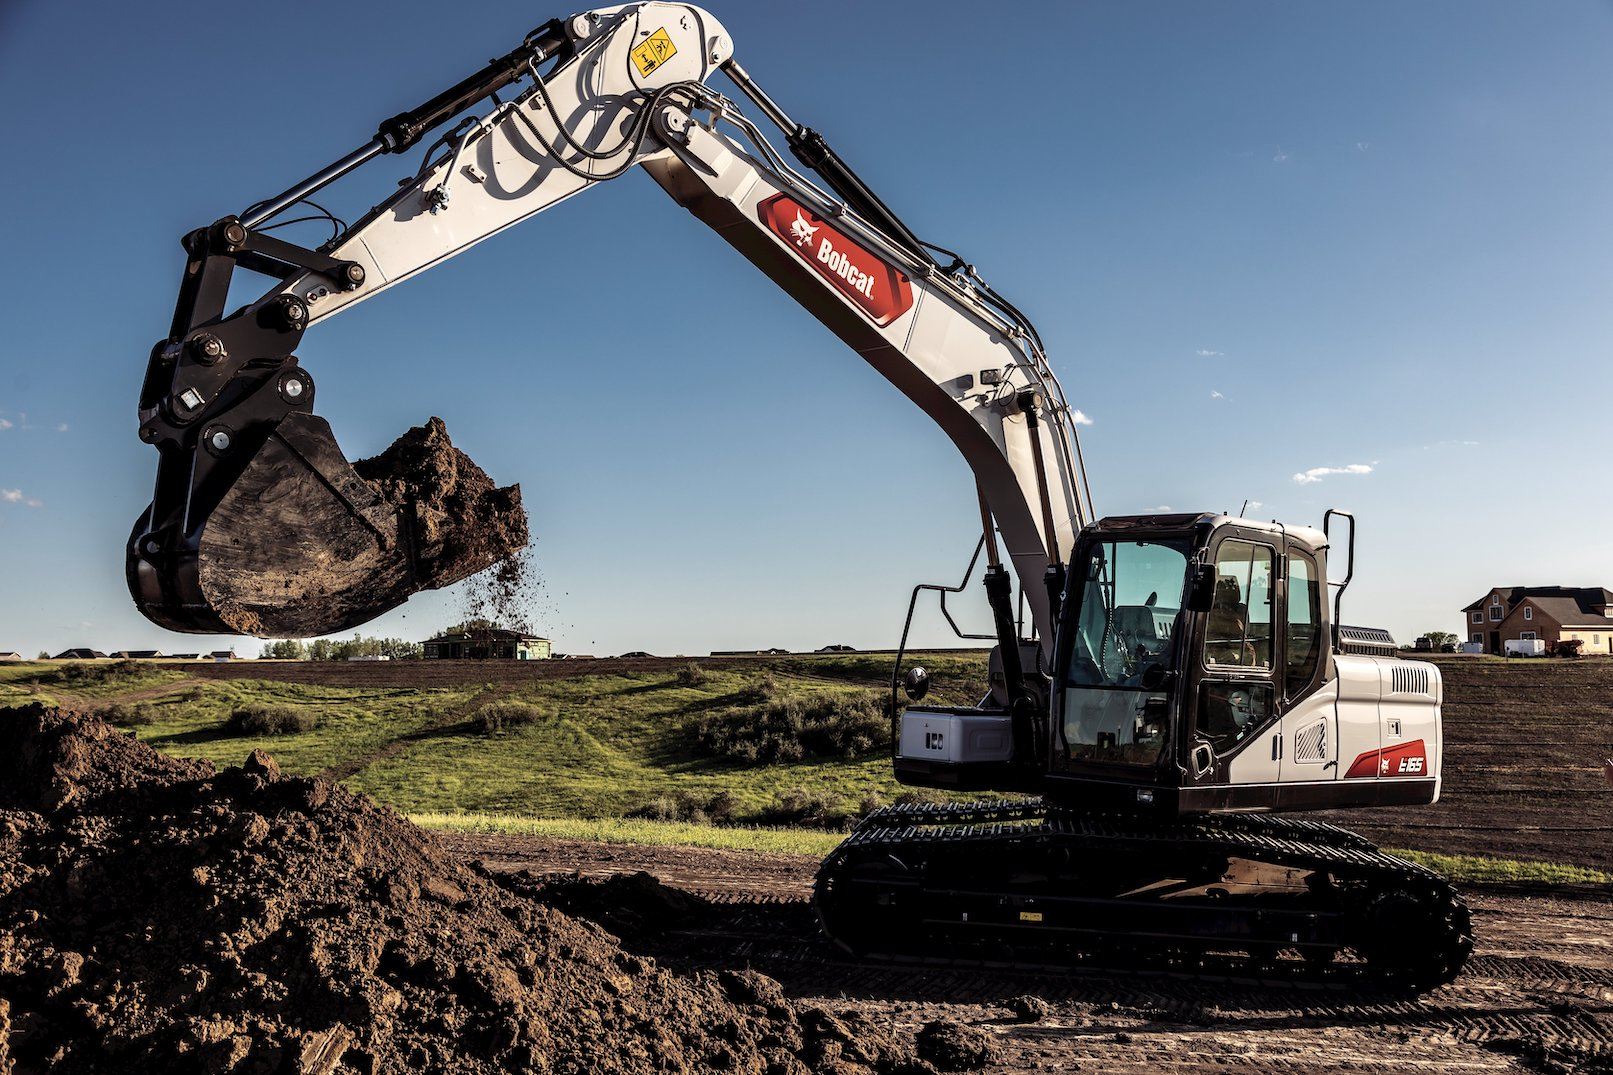 Bobcat E165 excavator digging